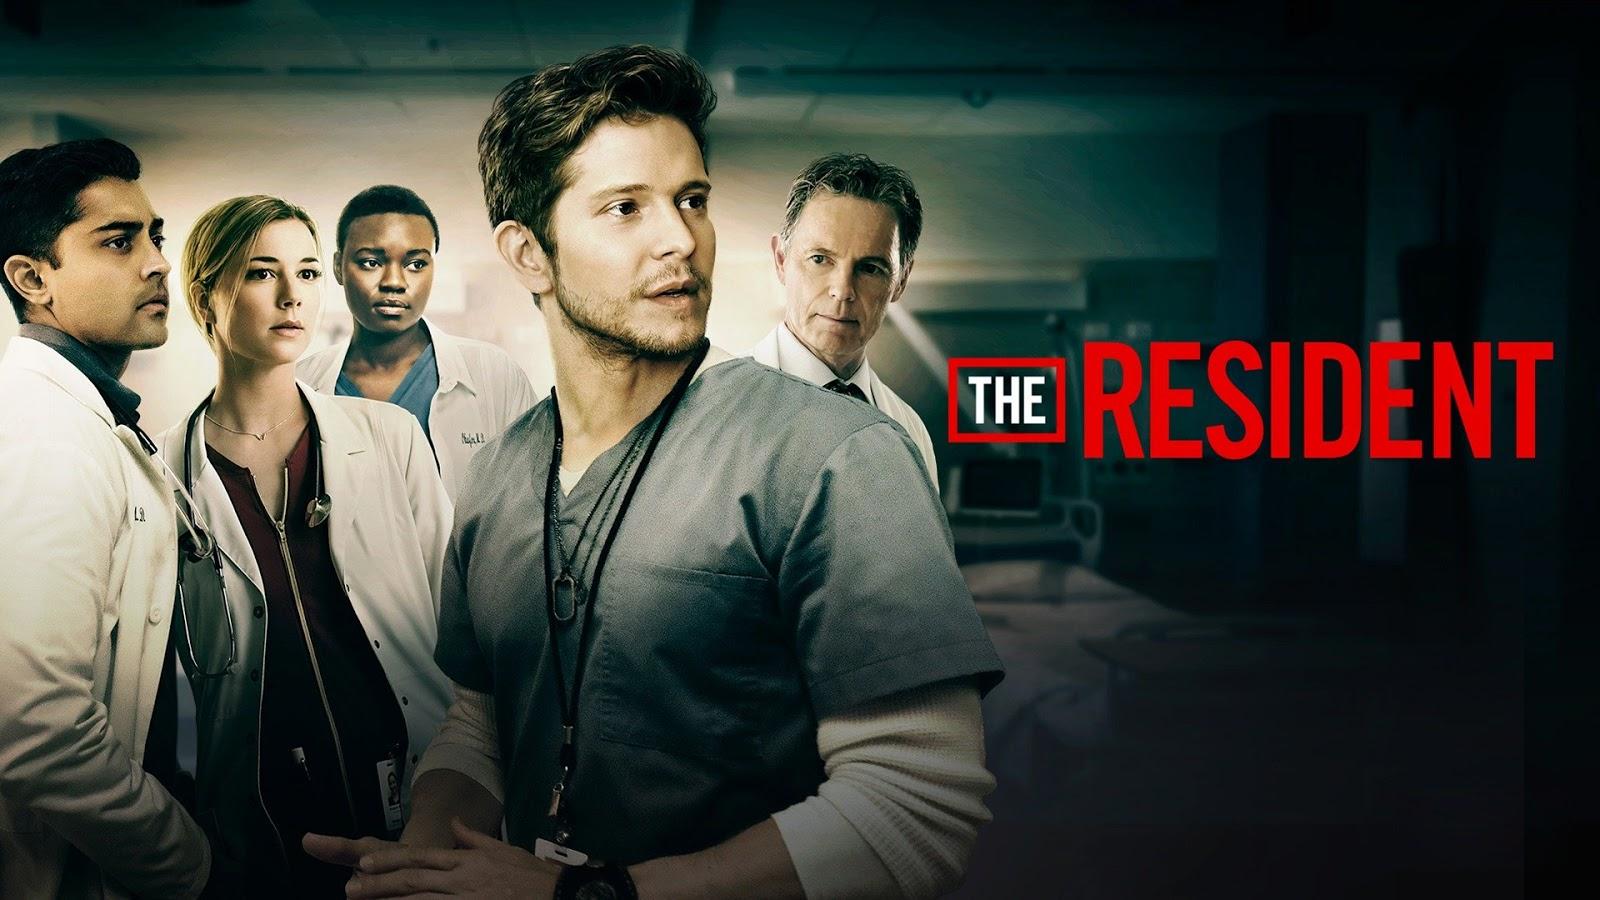 Protagonistas de The Resident, serie hospitalaria de Fox